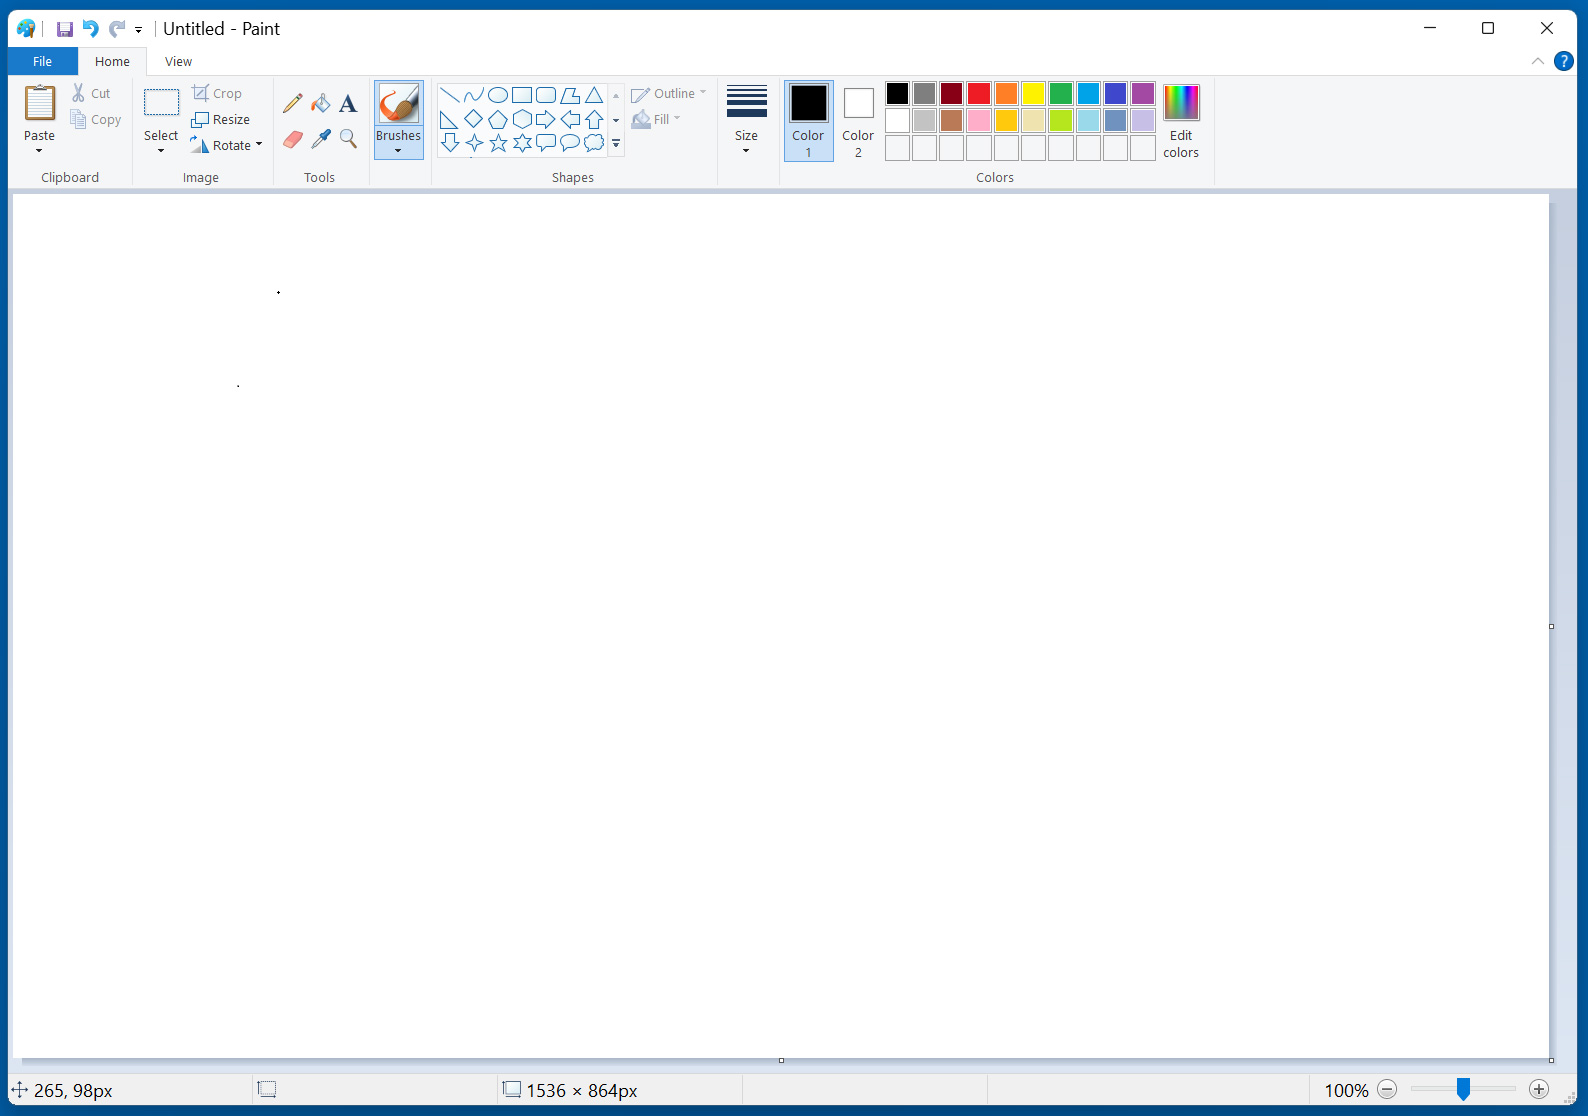 Current Microsoft Paint on Windows 11